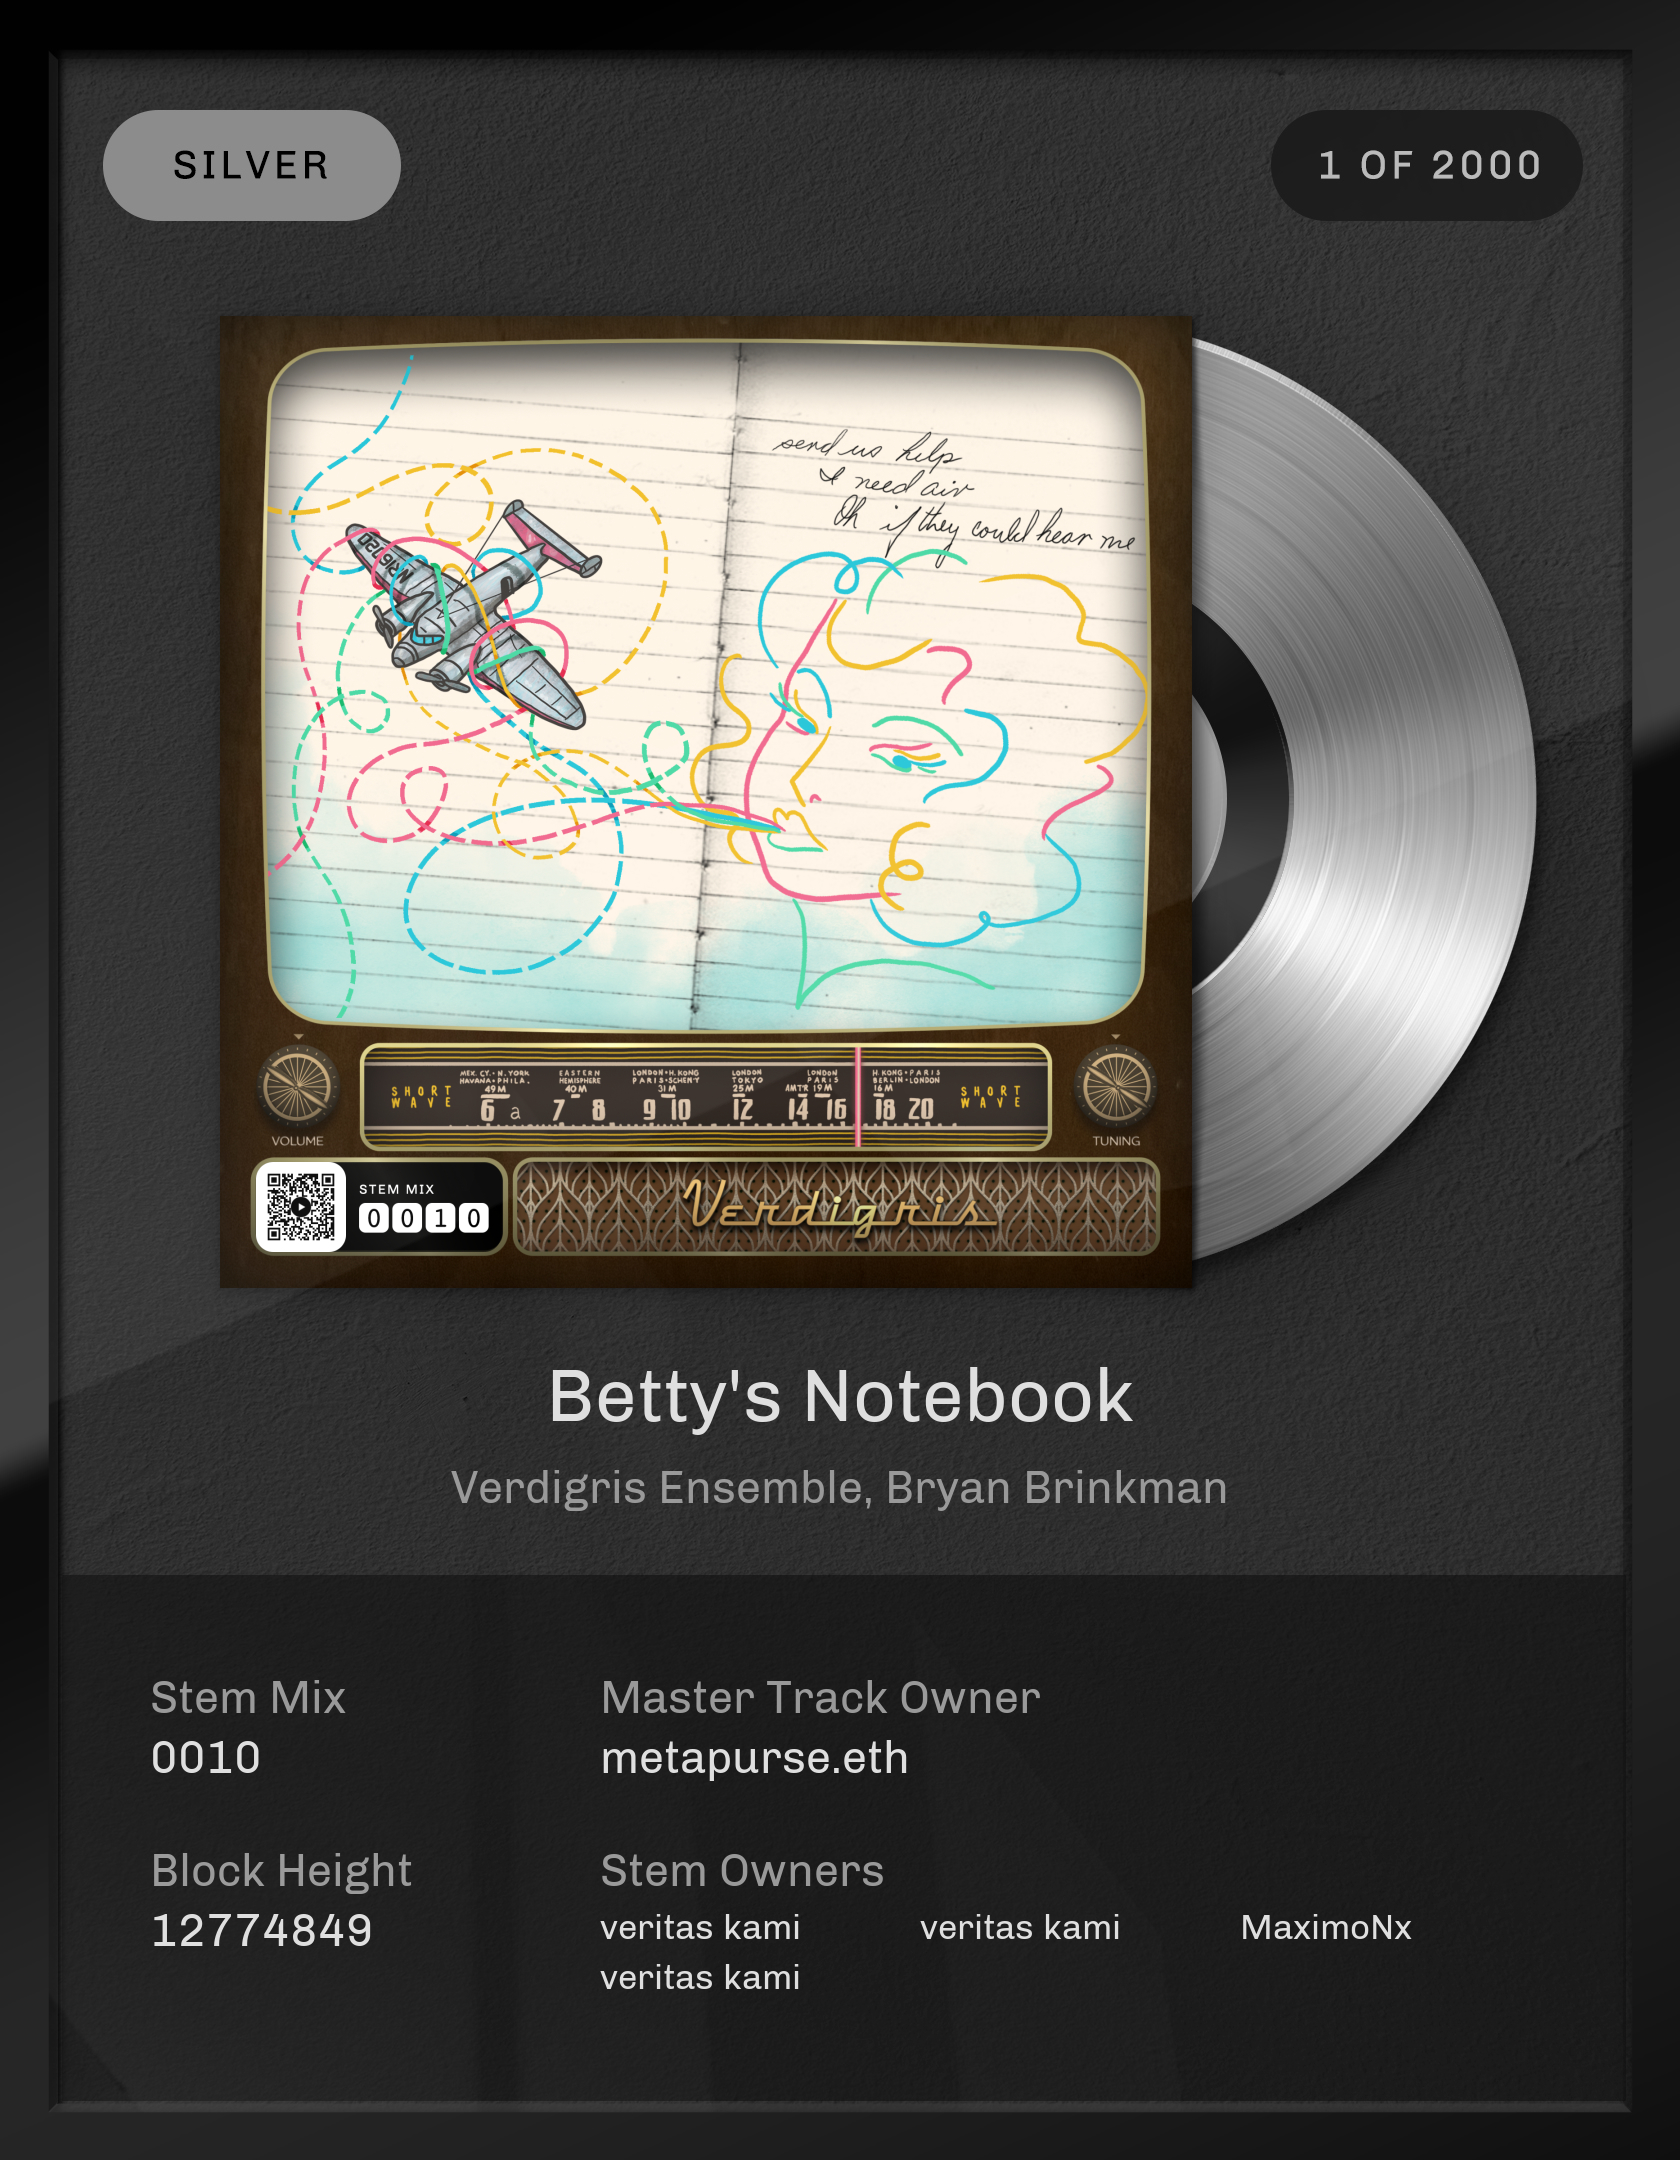 Betty's Notebook